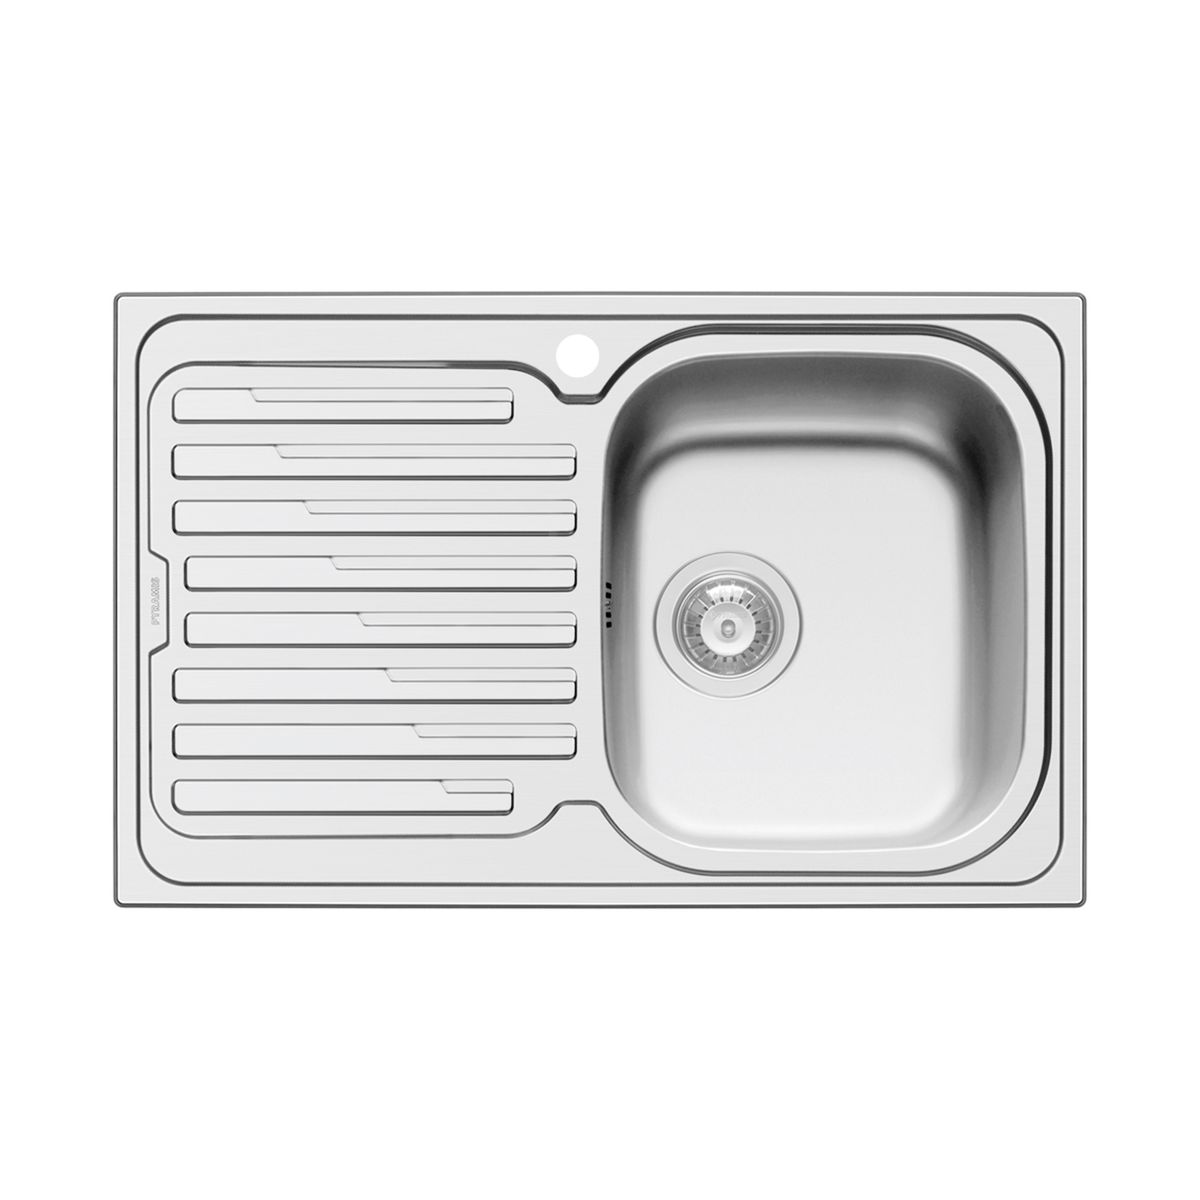 Emejing misure lavello cucina una vasca ideas ideas - Lavelli da incasso per cucina ...